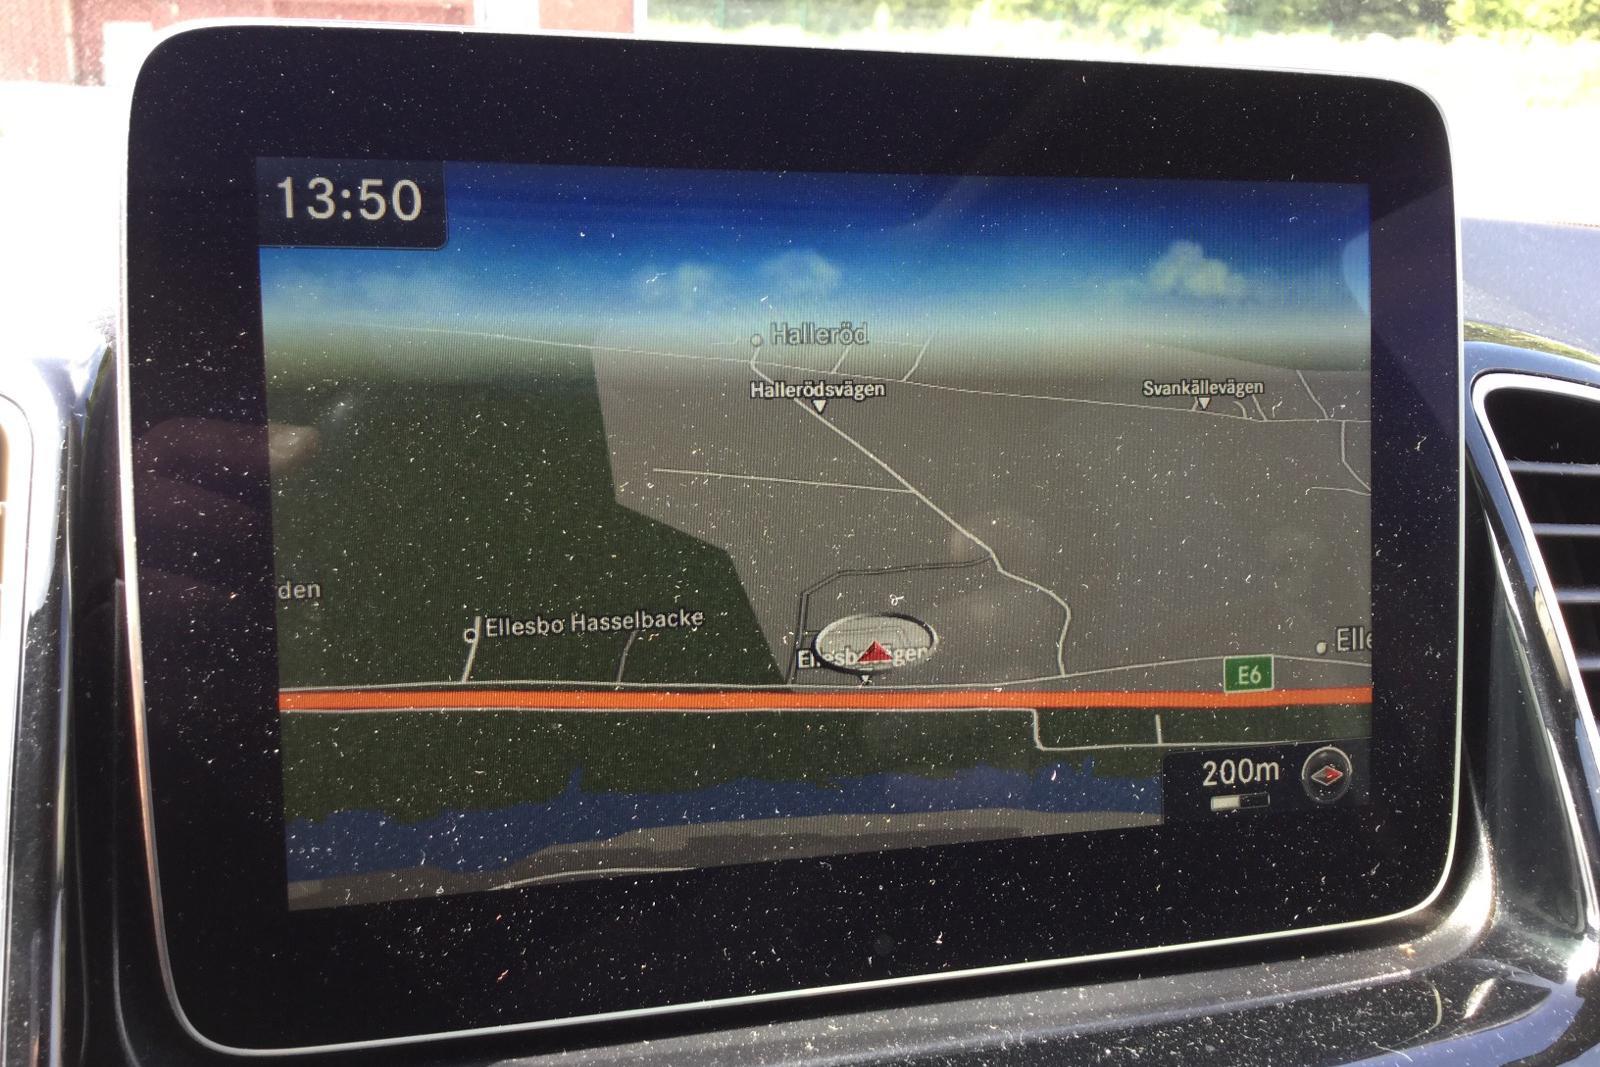 Mercedes GLE 350 d 4MATIC W166 (258hk) - 81 430 km - Automatic - black - 2017